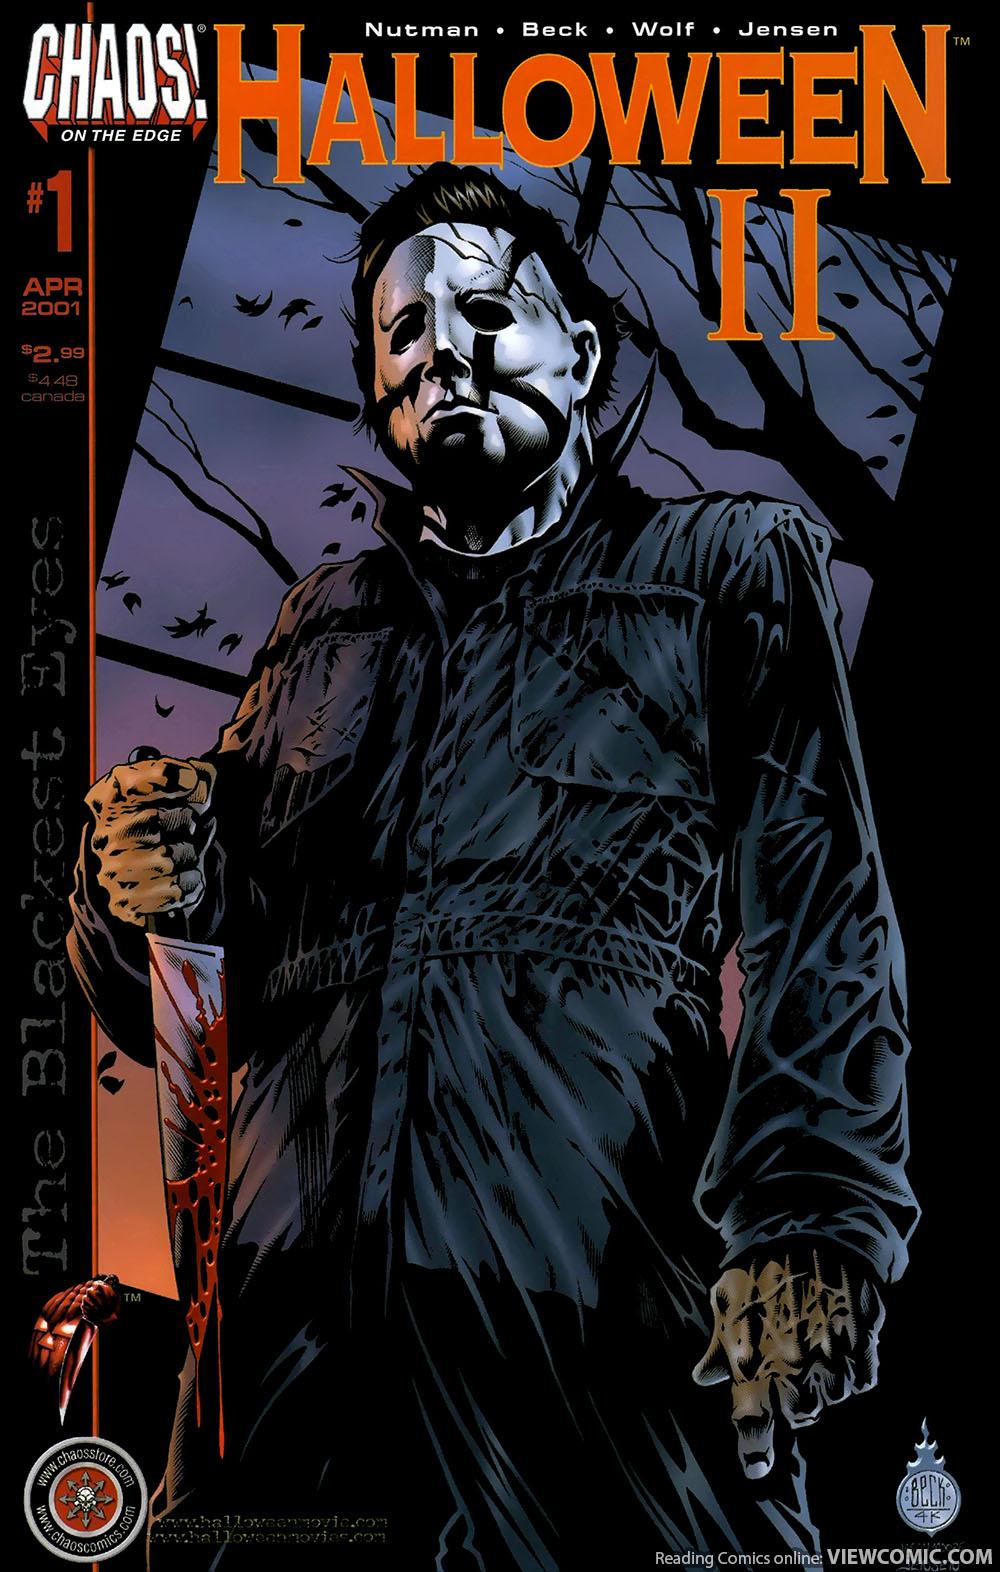 Chaos Comic – Halloween II The Blackest Eyes 01 (2001) | Viewcomic ...